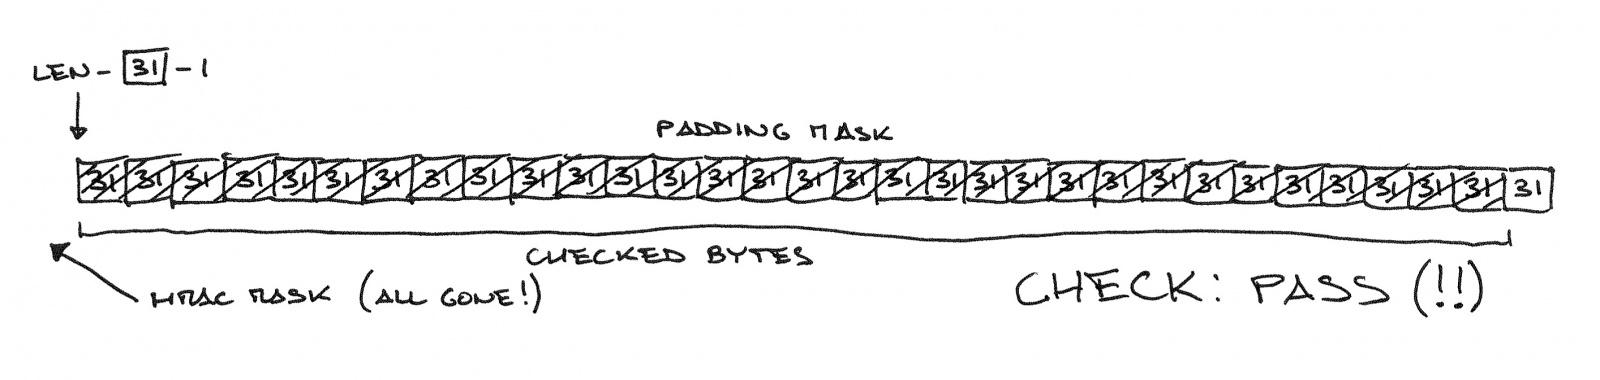 Padding Oracle Attack: криптография по-прежнему пугает - 10